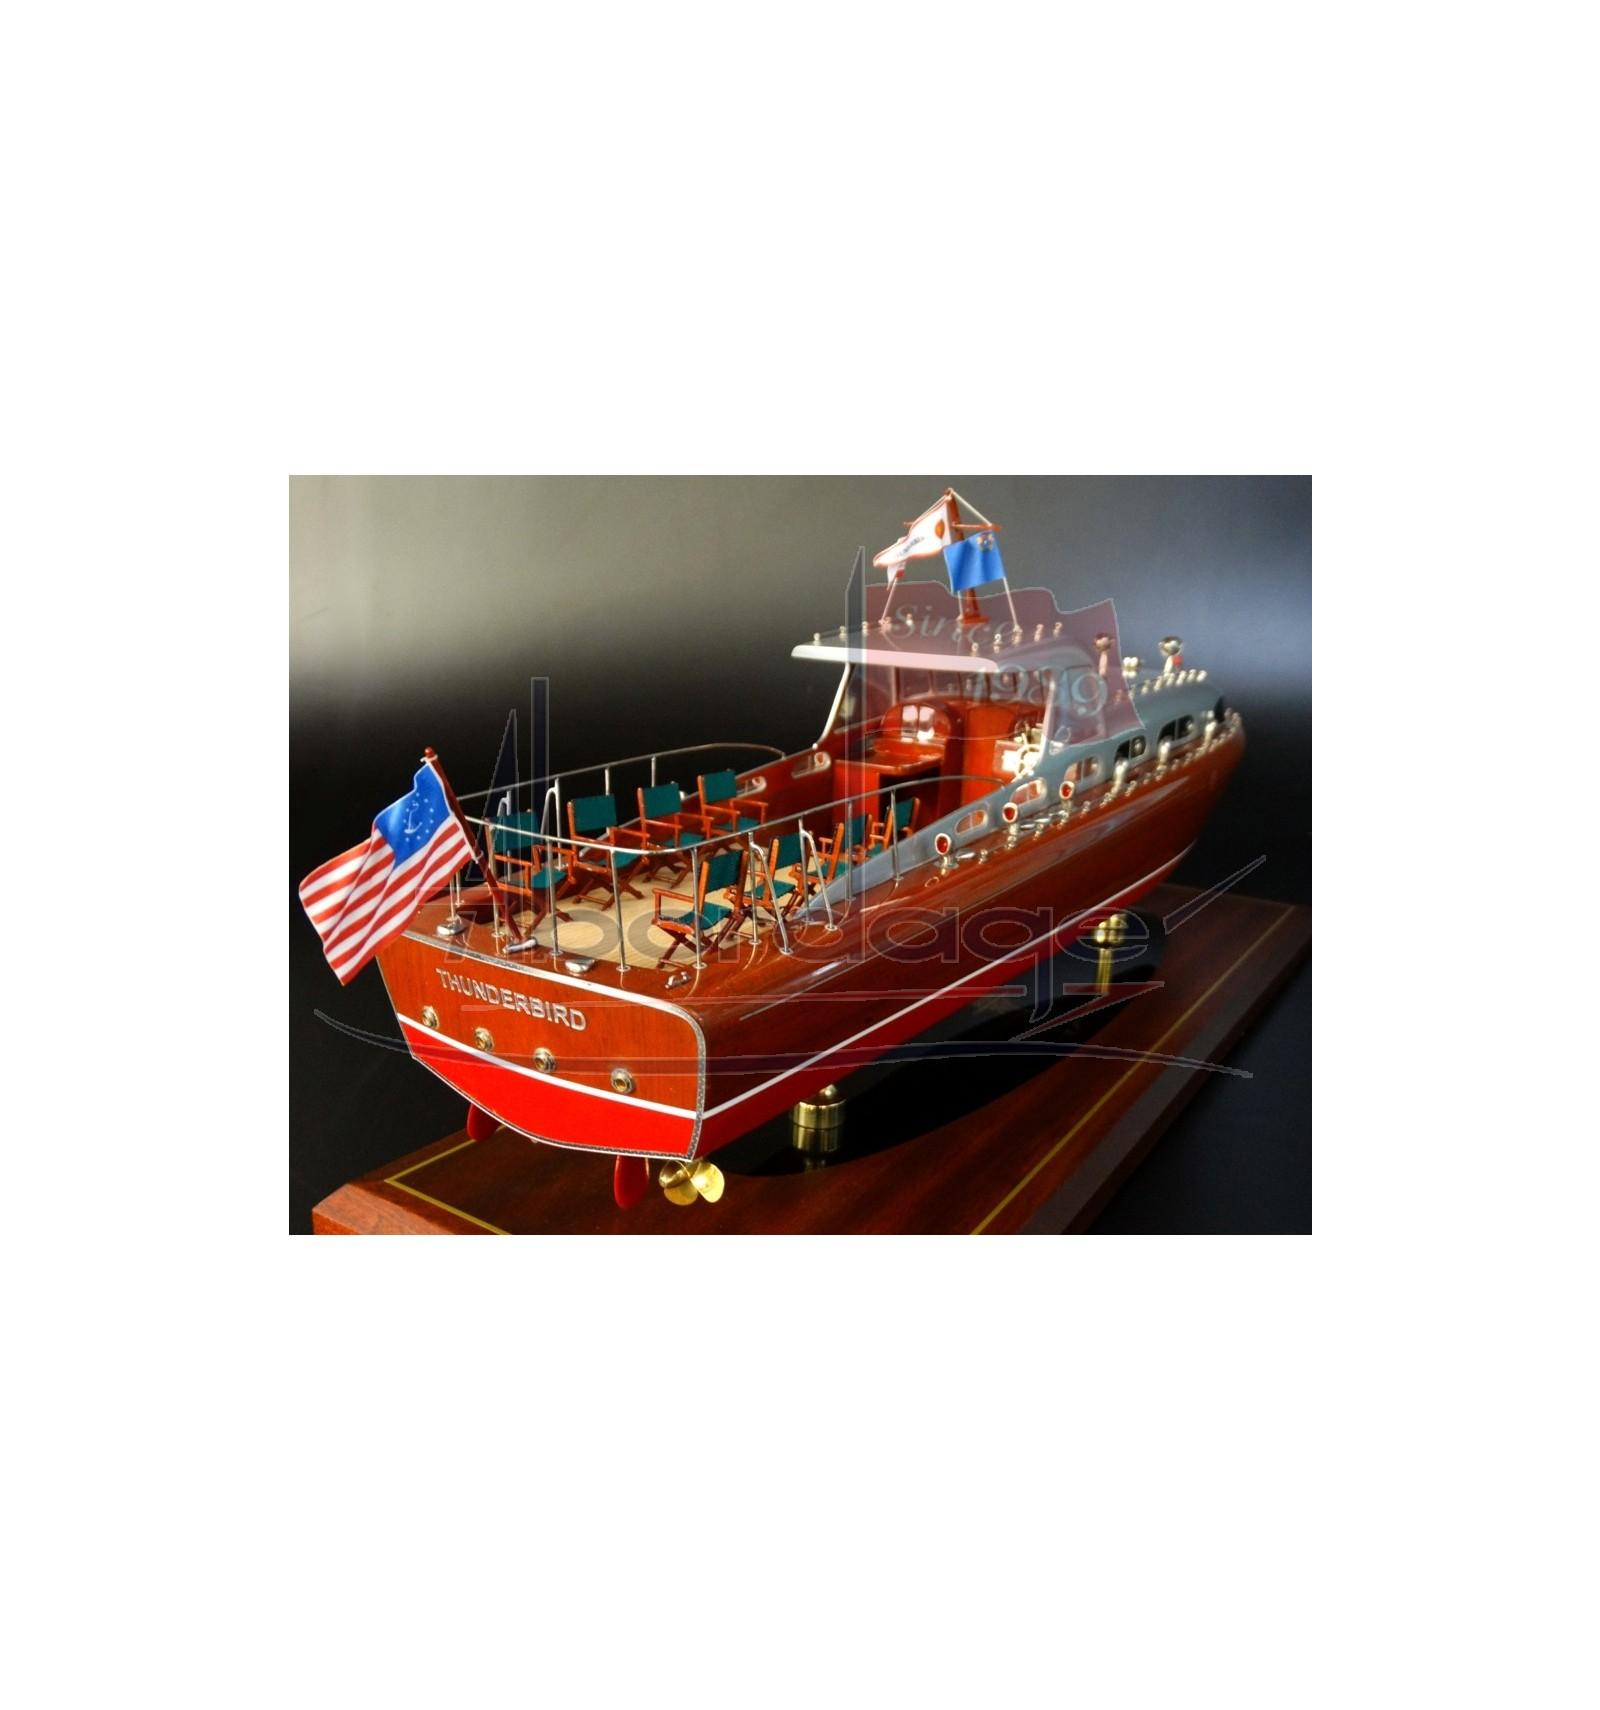 Hacker Craft 55 Thunderbird Ship Model Built By Abordage